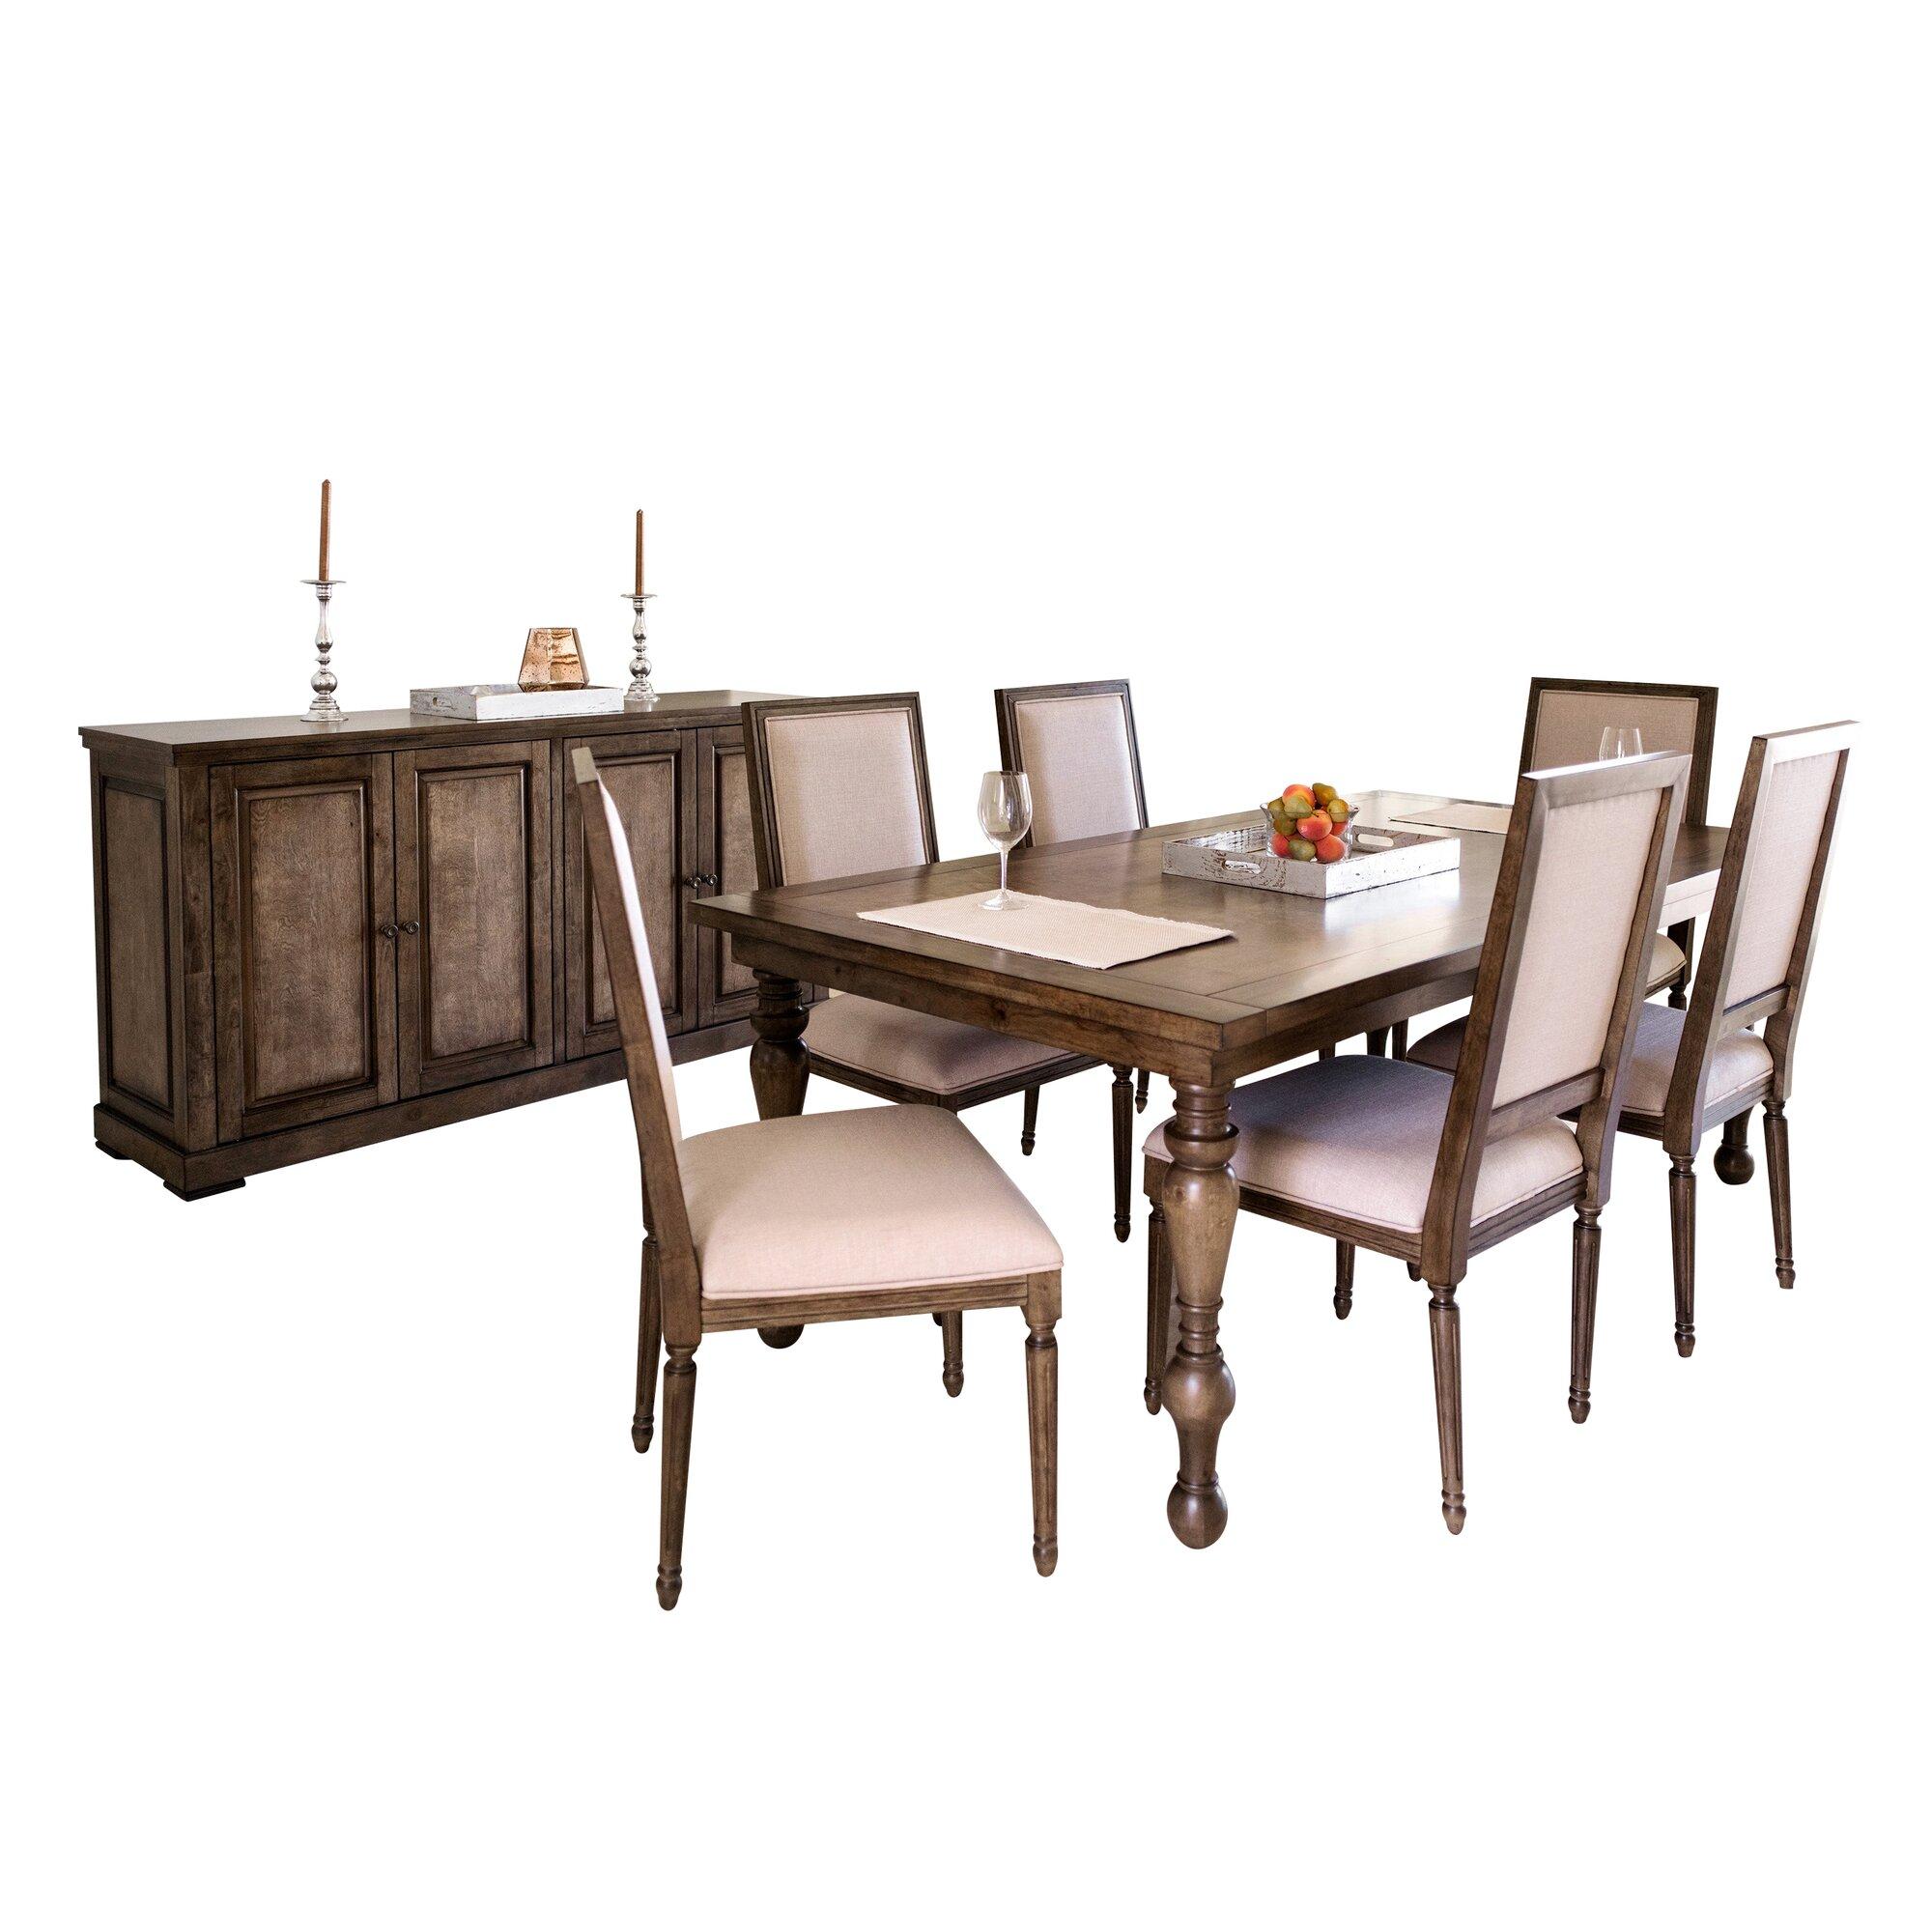 laurel foundry modern farmhouse sainte rose 8 piece dining set. Black Bedroom Furniture Sets. Home Design Ideas